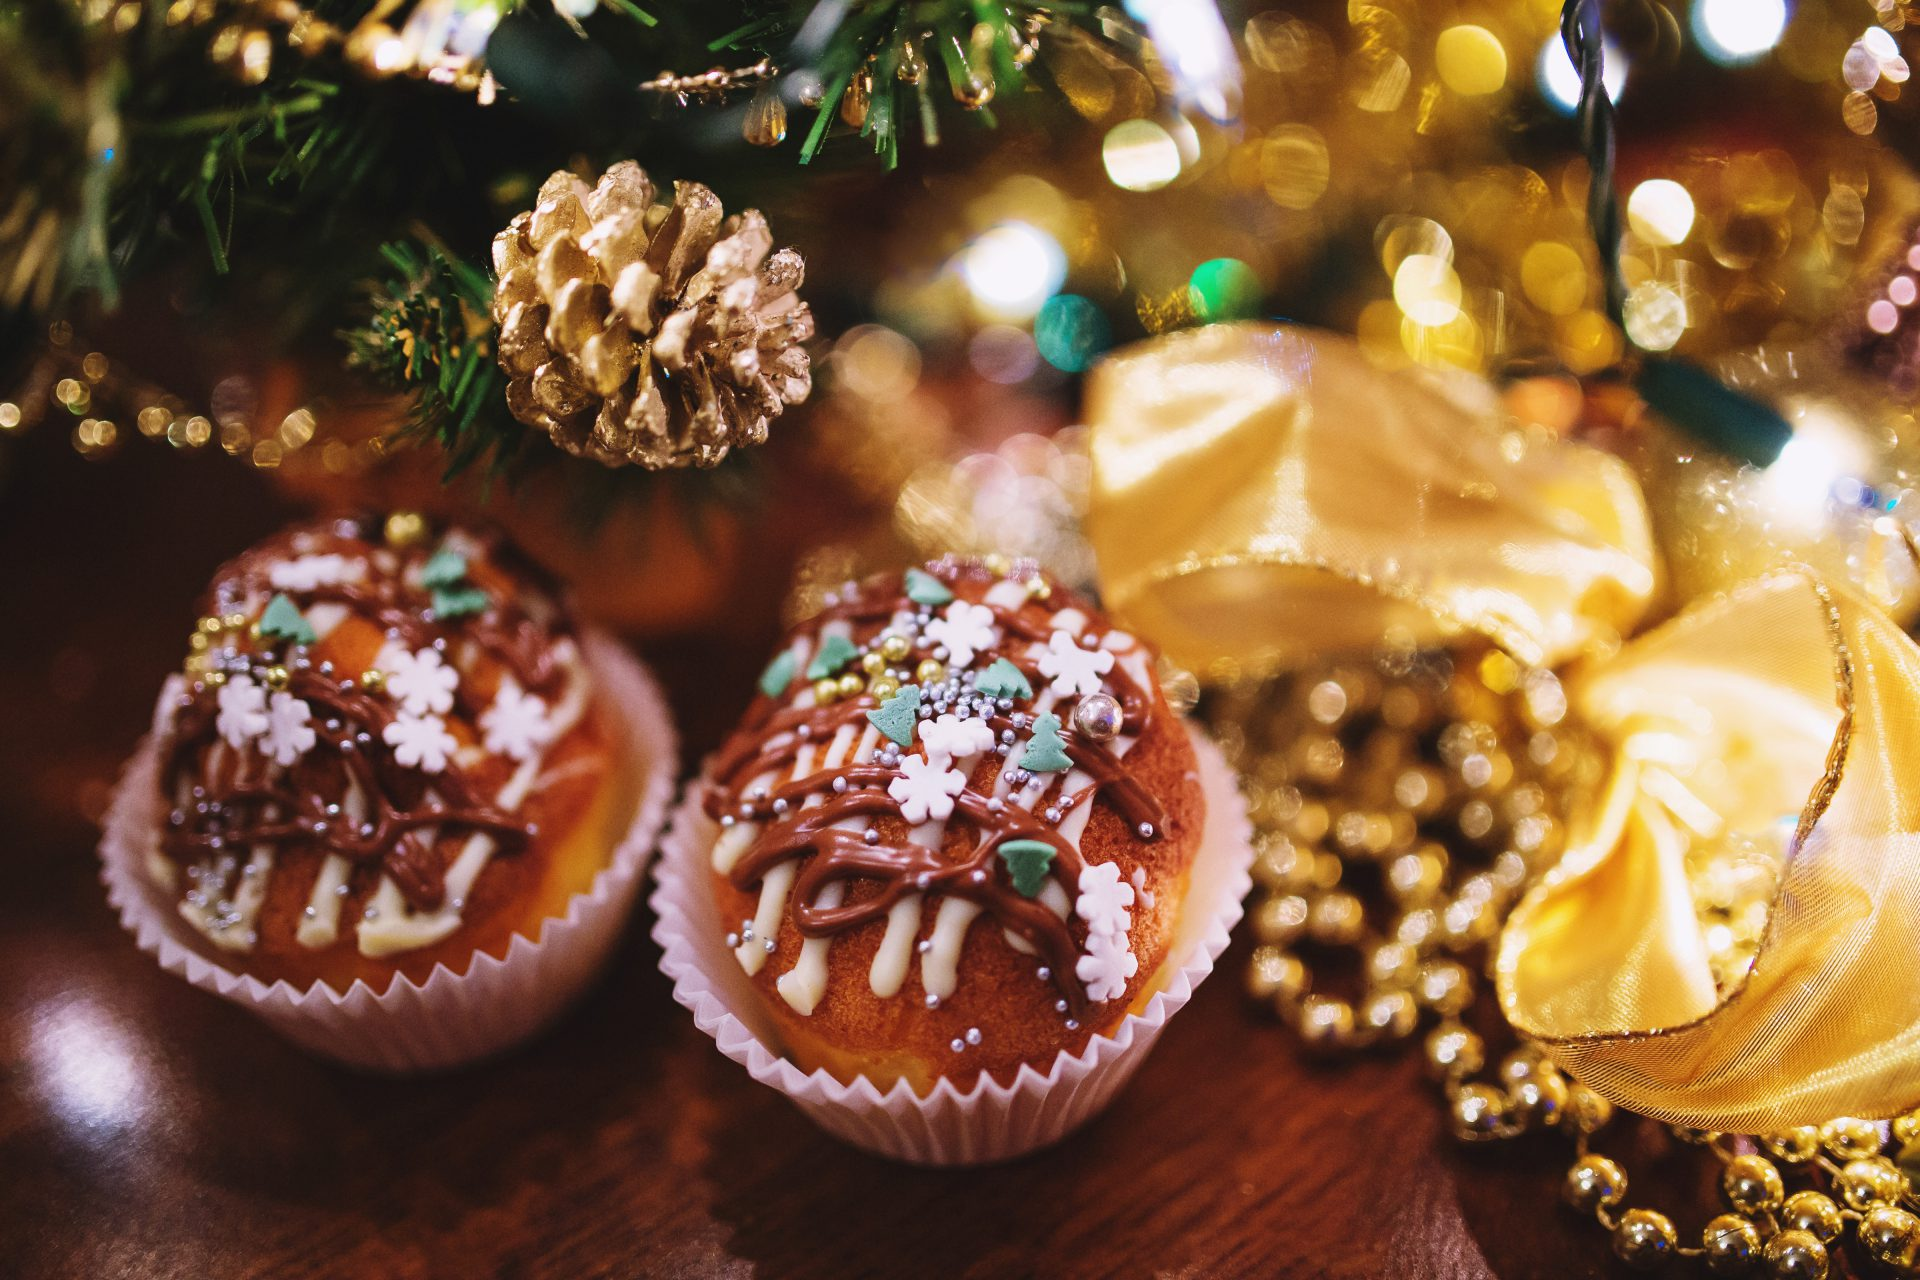 Dronken muffins